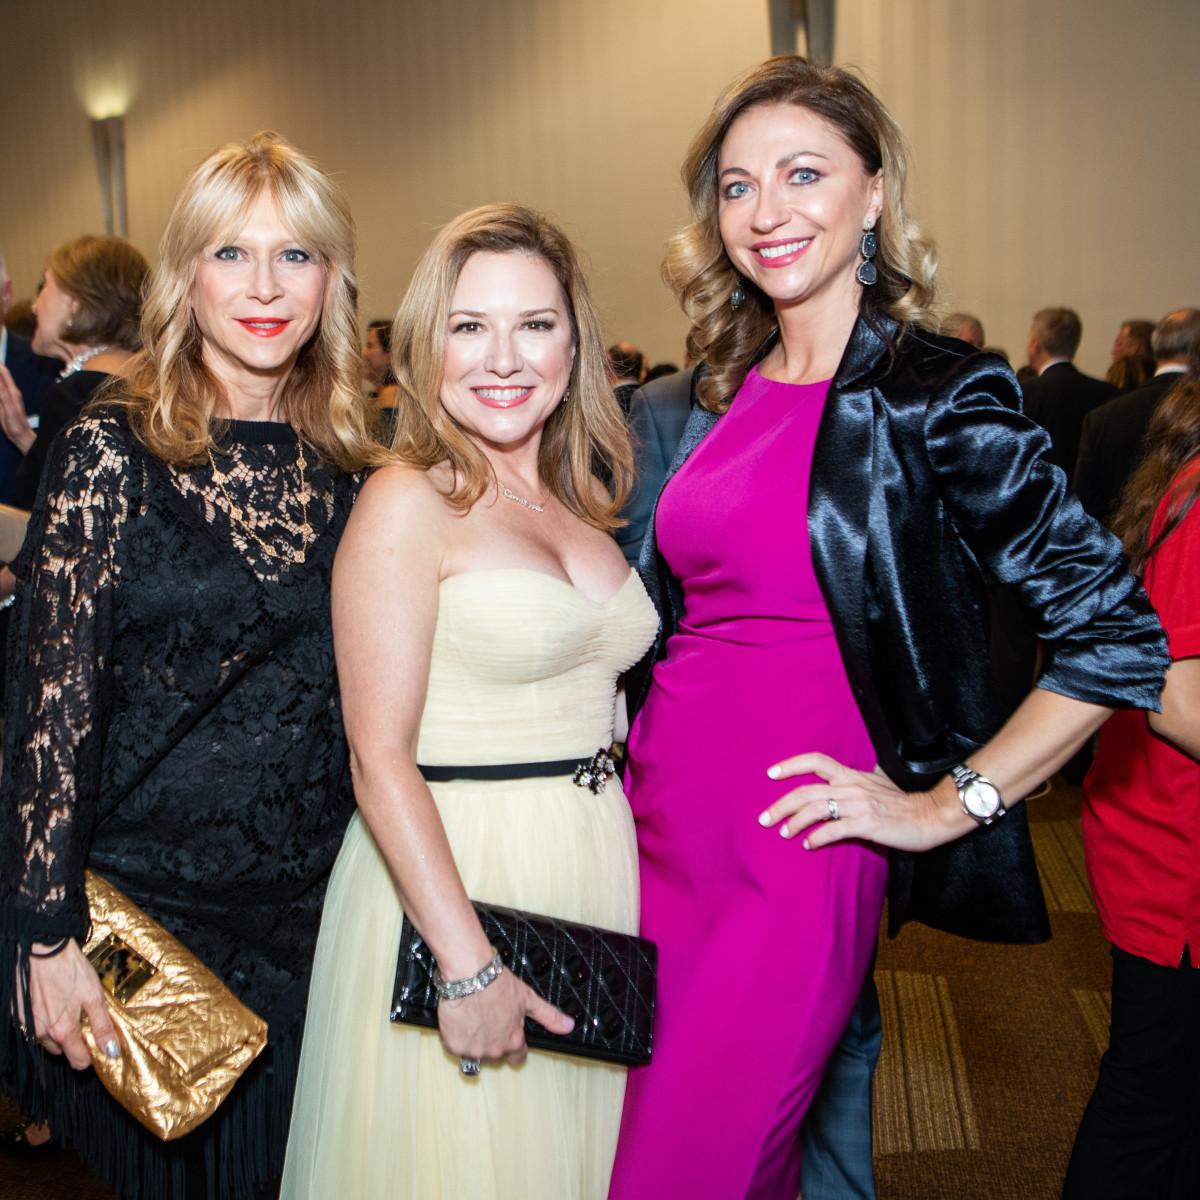 Crime Stoppers Gala 2019 Liena Morrison, Donae Chramosta, Yelena Grinina